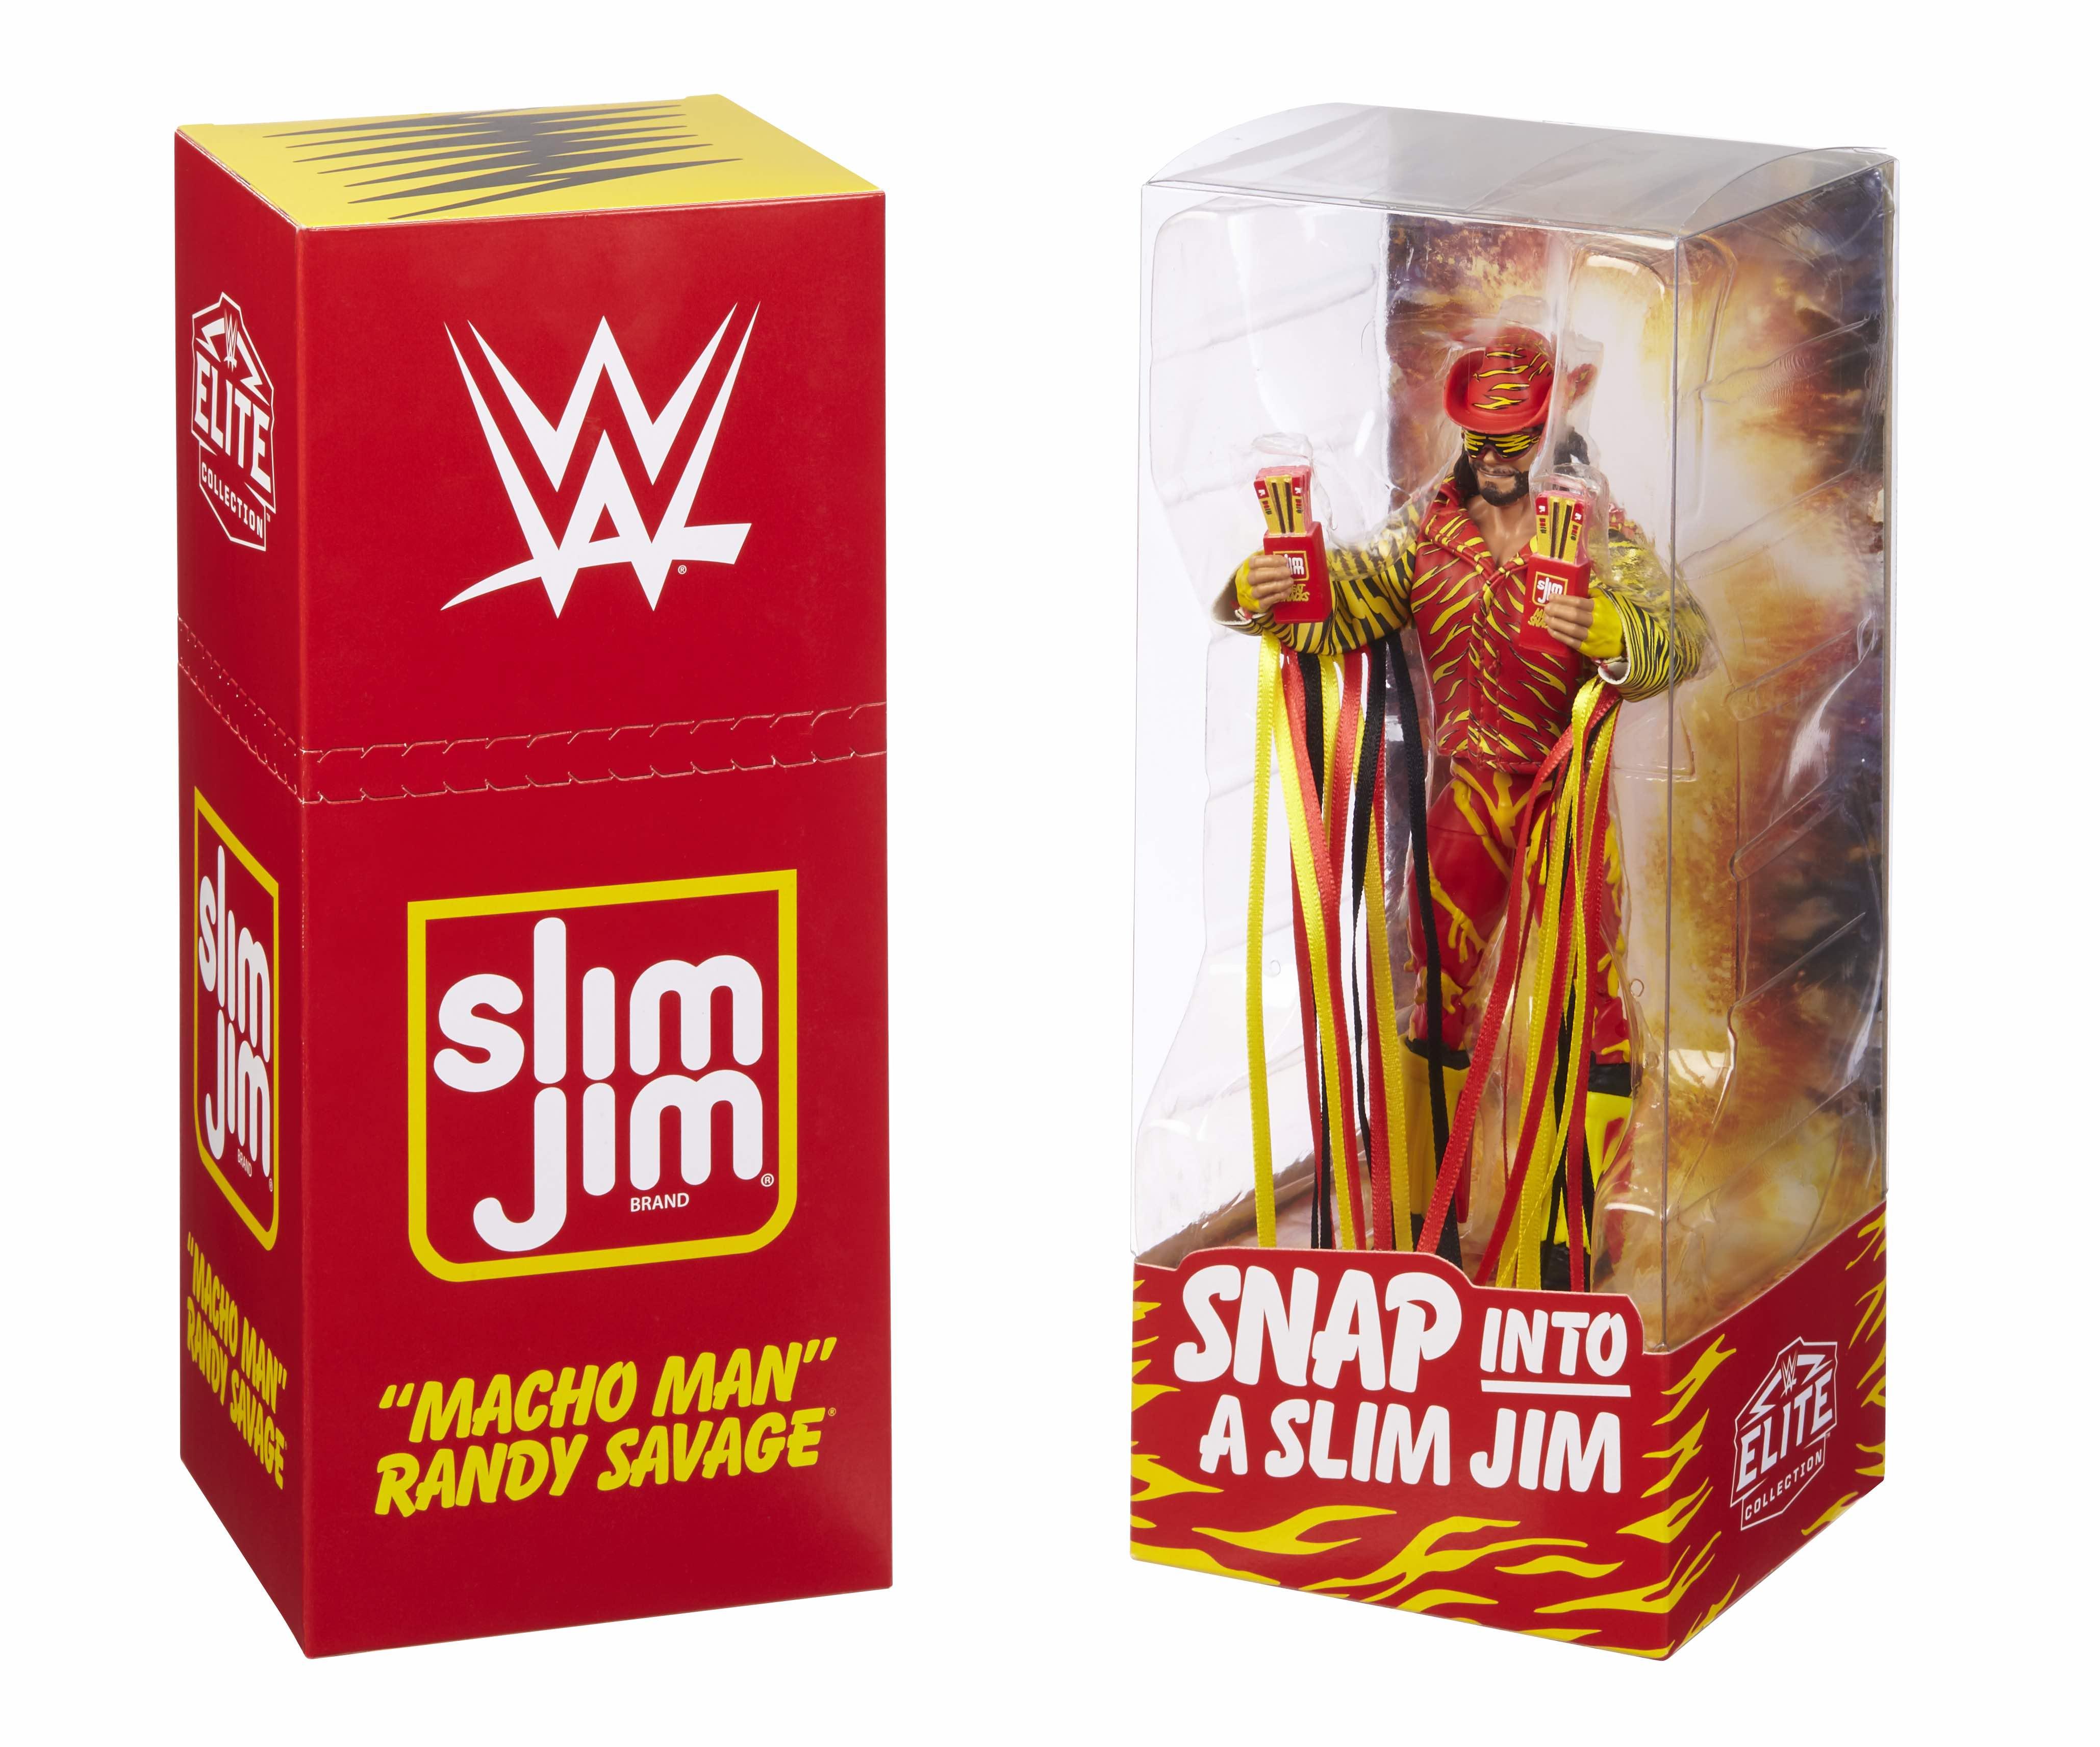 WWE SDCC Exclusive Slim Jim Macho Man Randy Savage Figure Nouvelle.